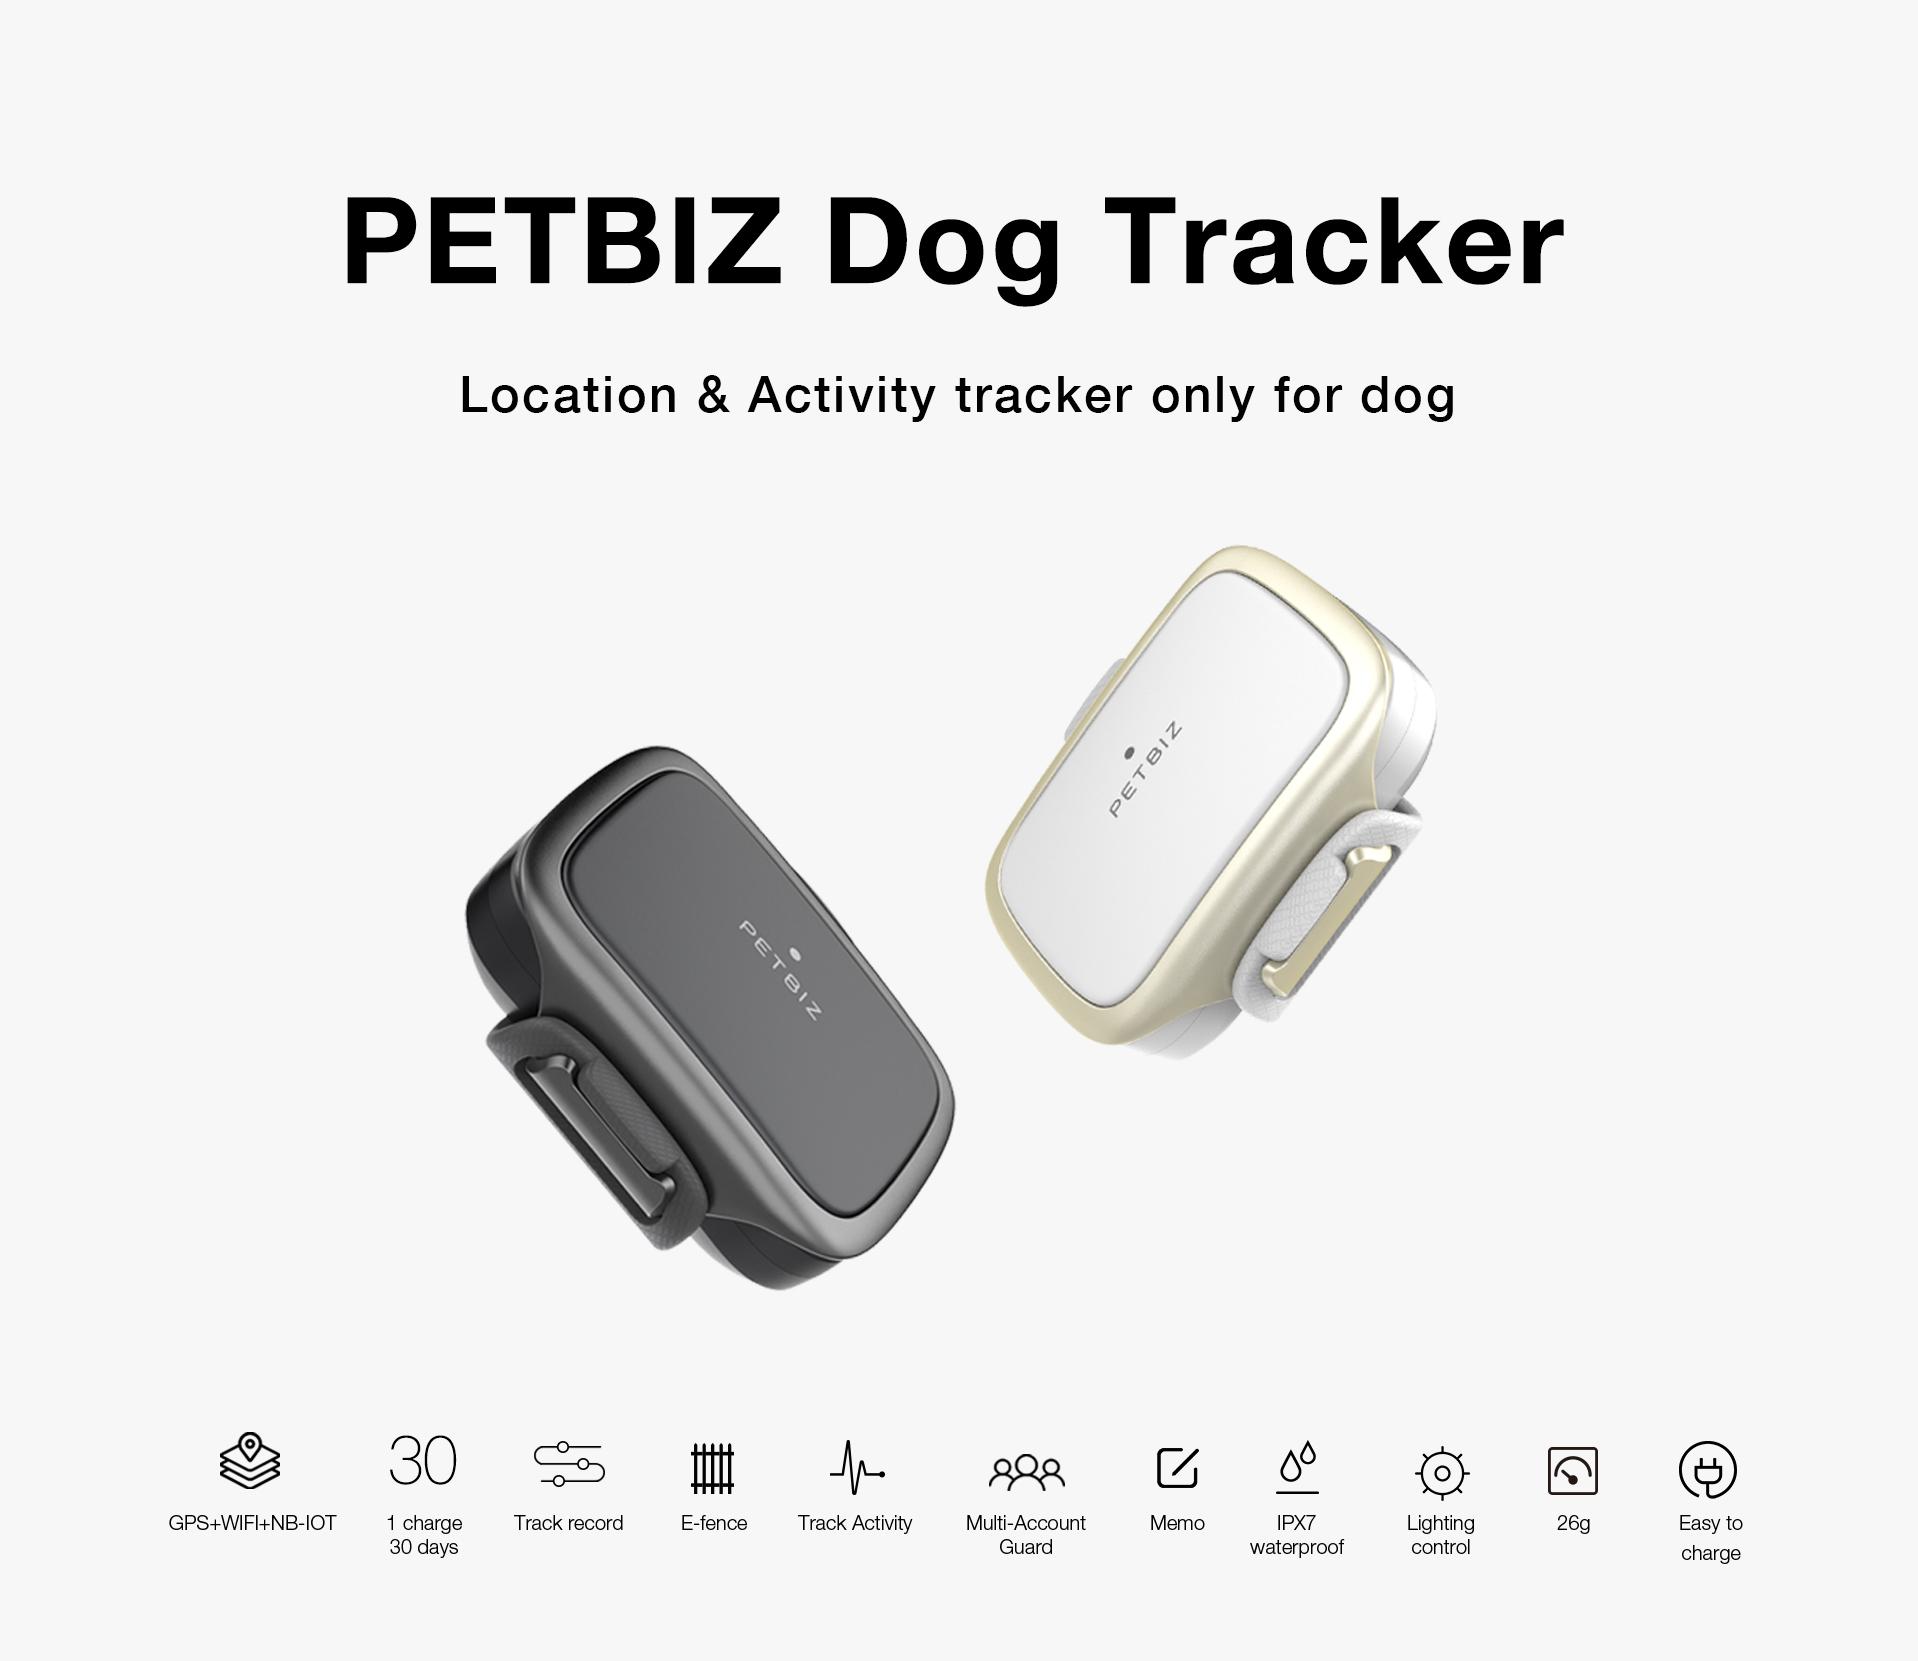 PetBiz Dog Tracker black and white